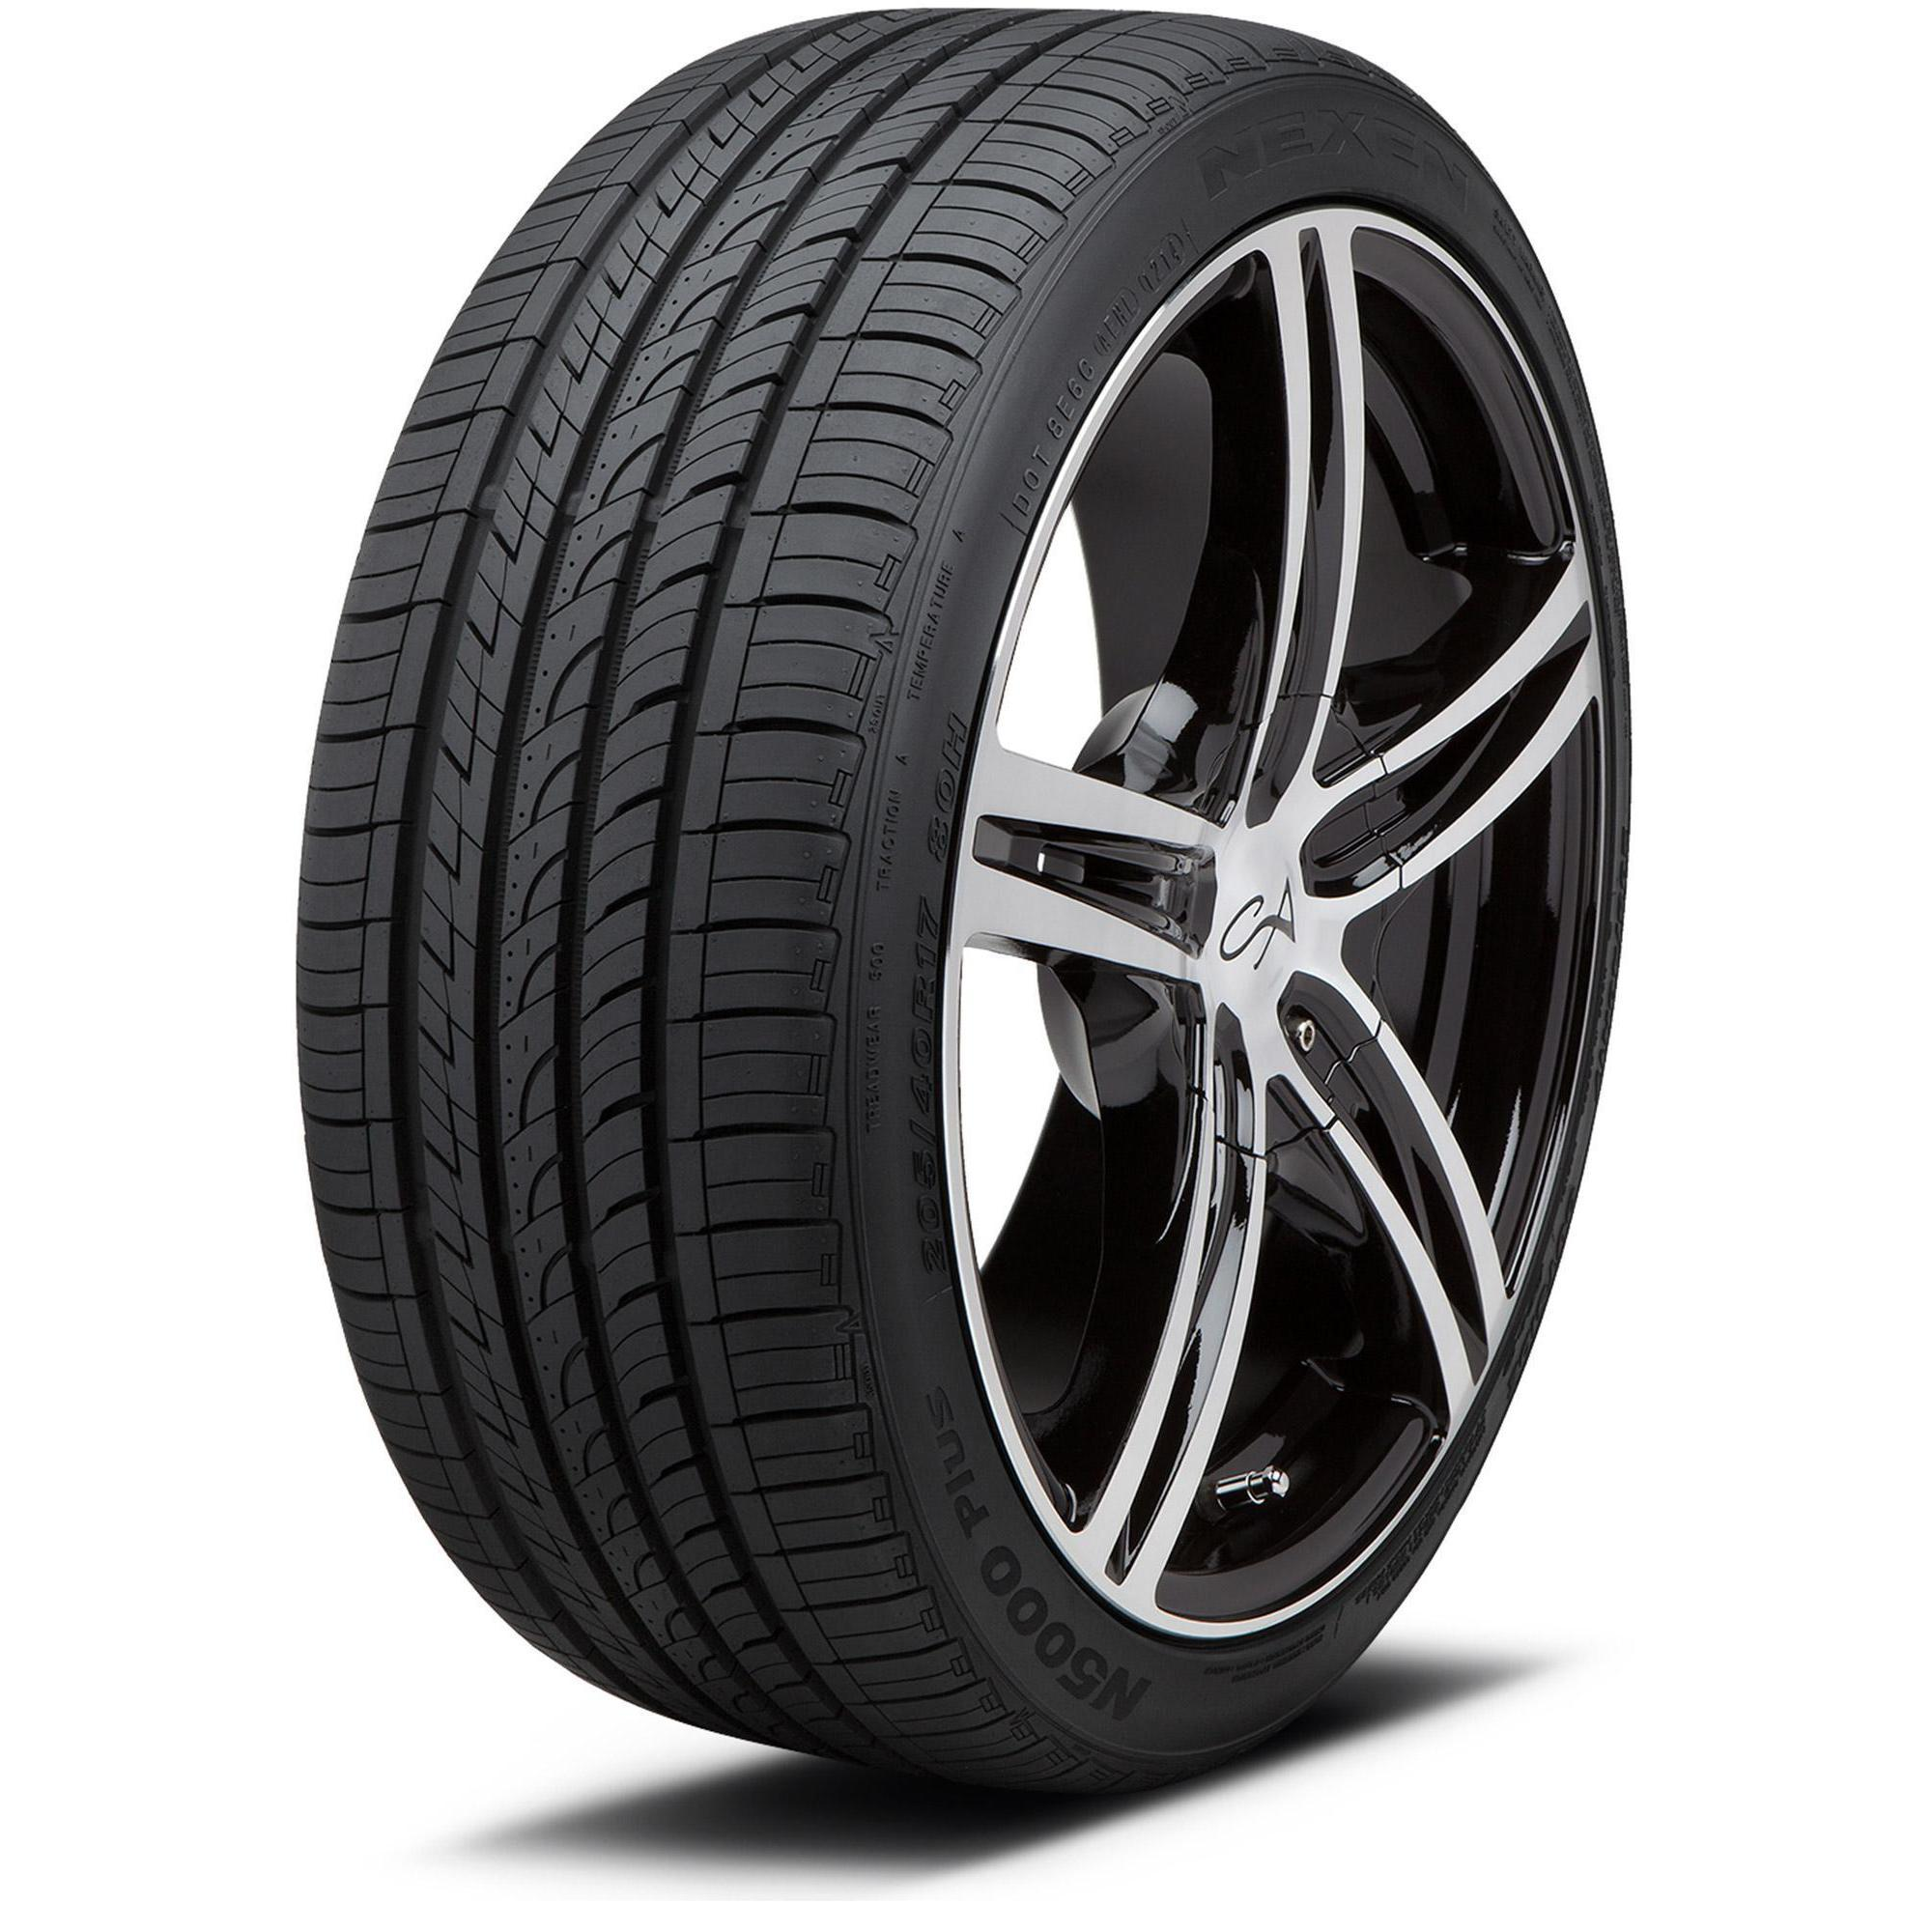 Nexen N5000 215/55 R 16 Tubeless 91 H Car Tyre